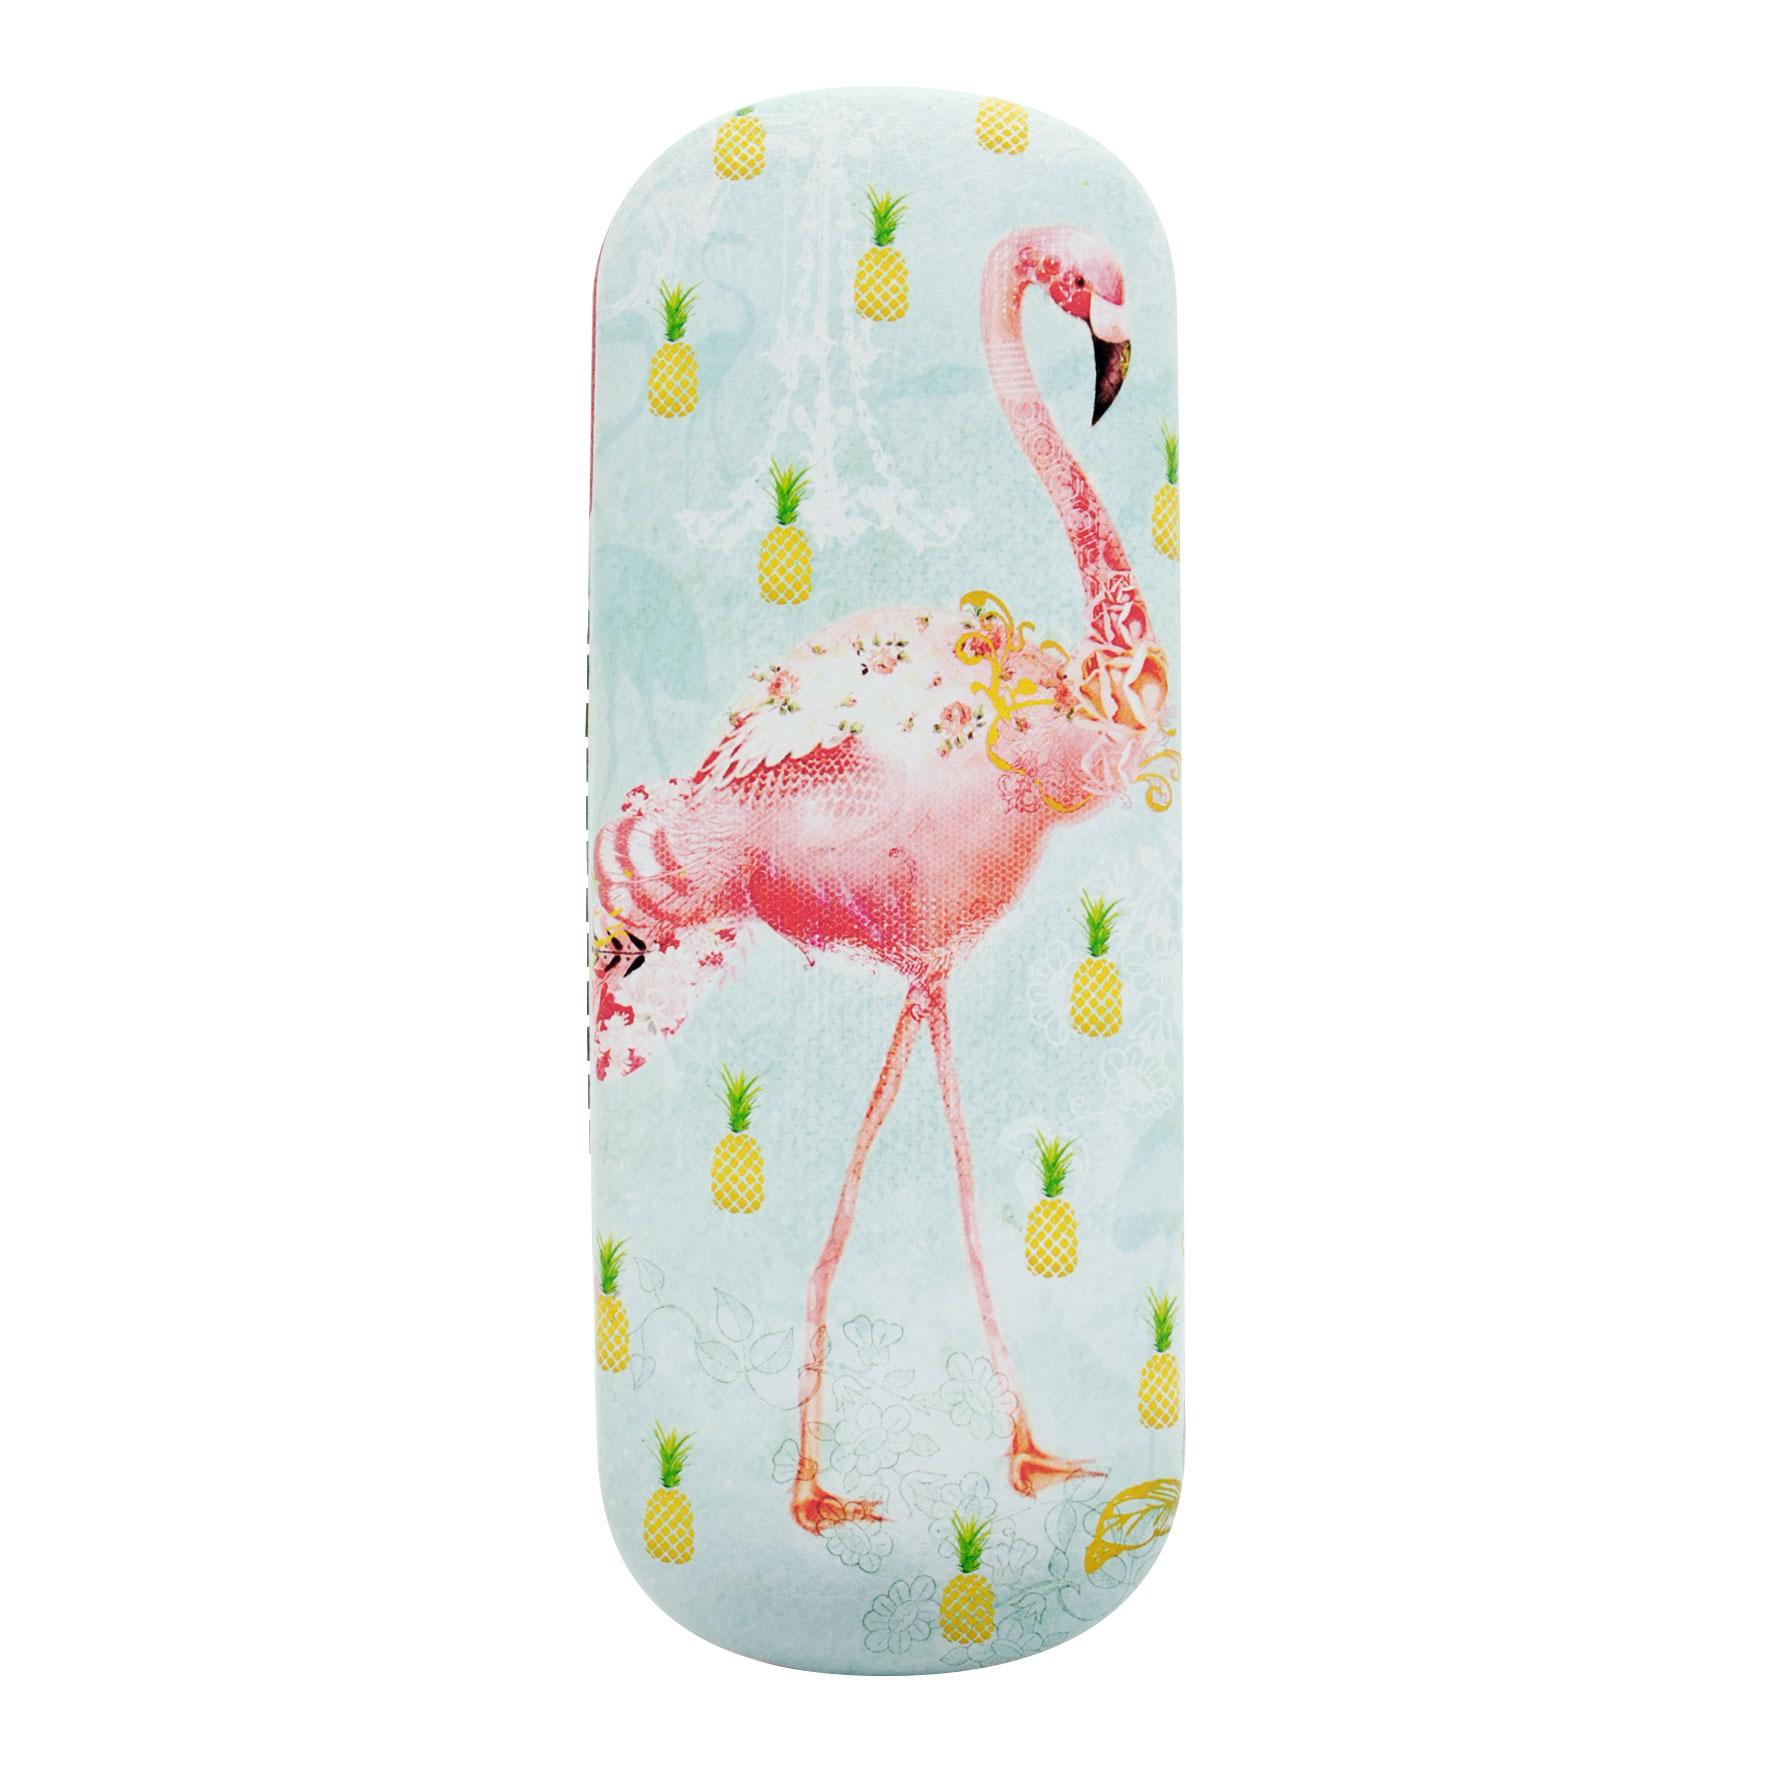 Santoro London - Pouzdro na brýle - Flamingos